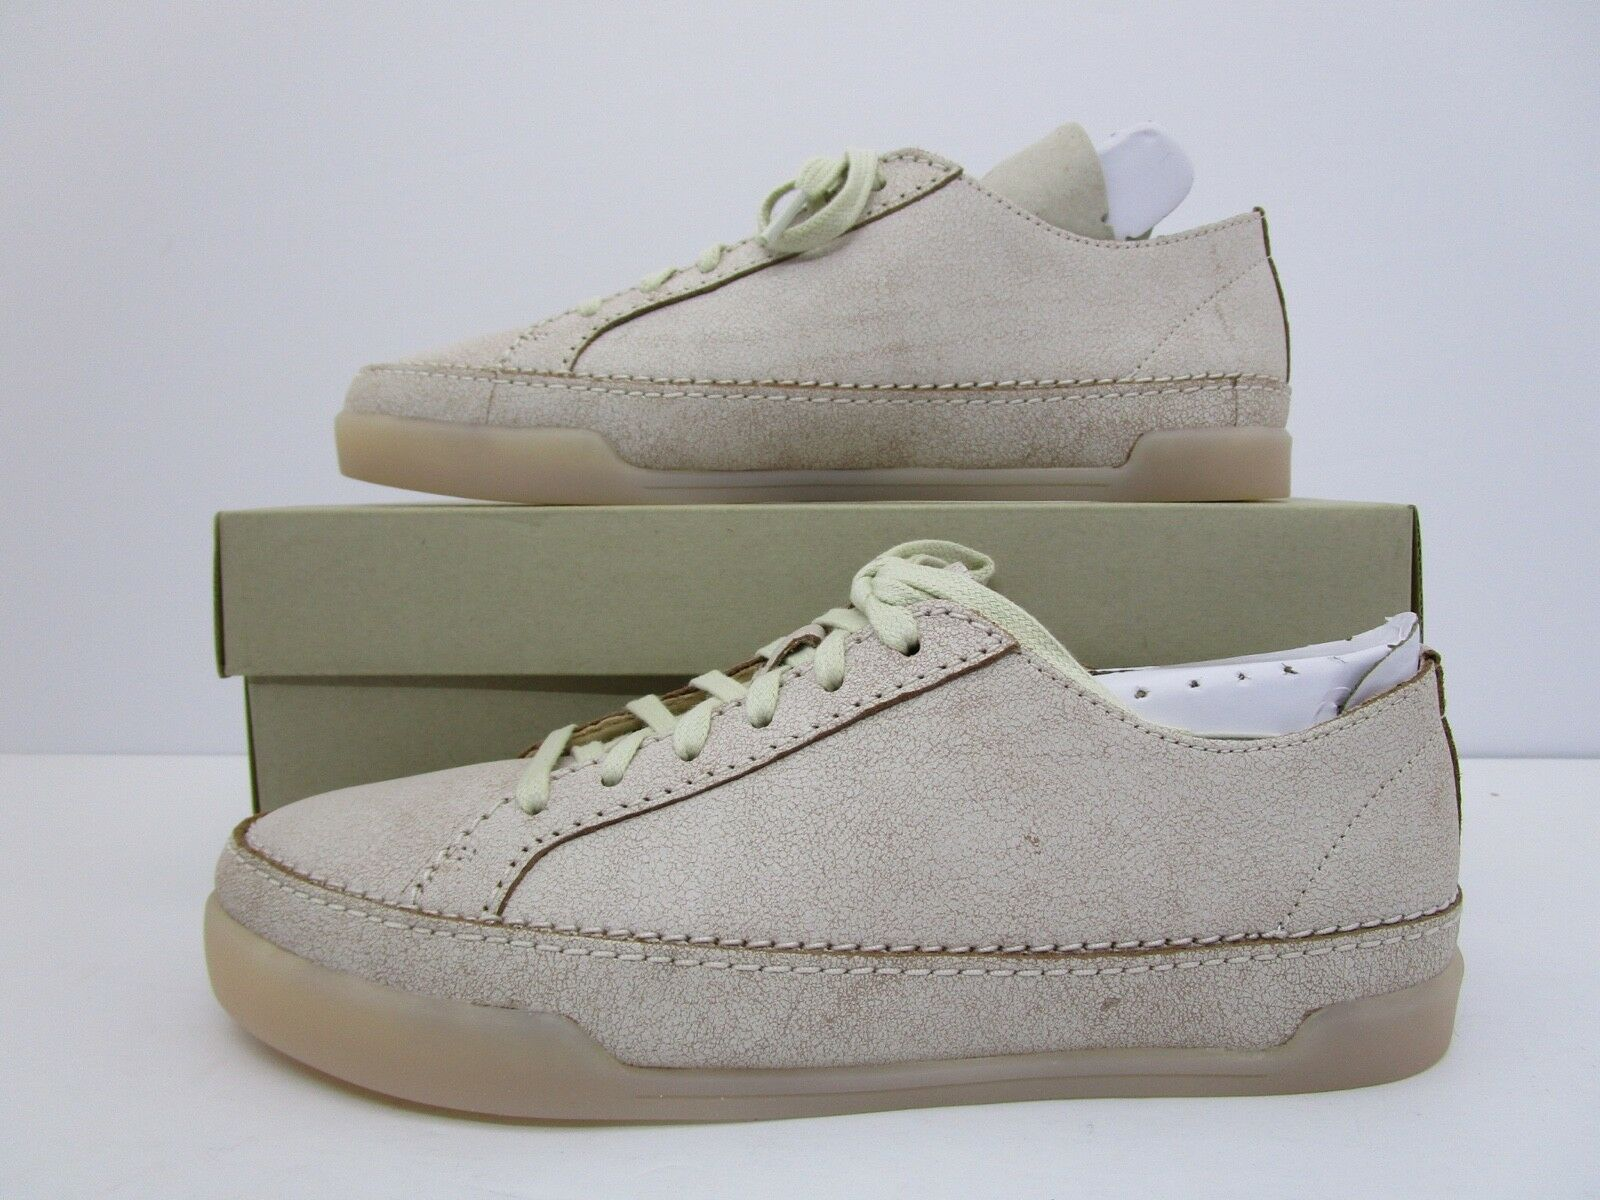 CLARKS Women's Hidi Holly Sneaker White Leather Size 6.5 M